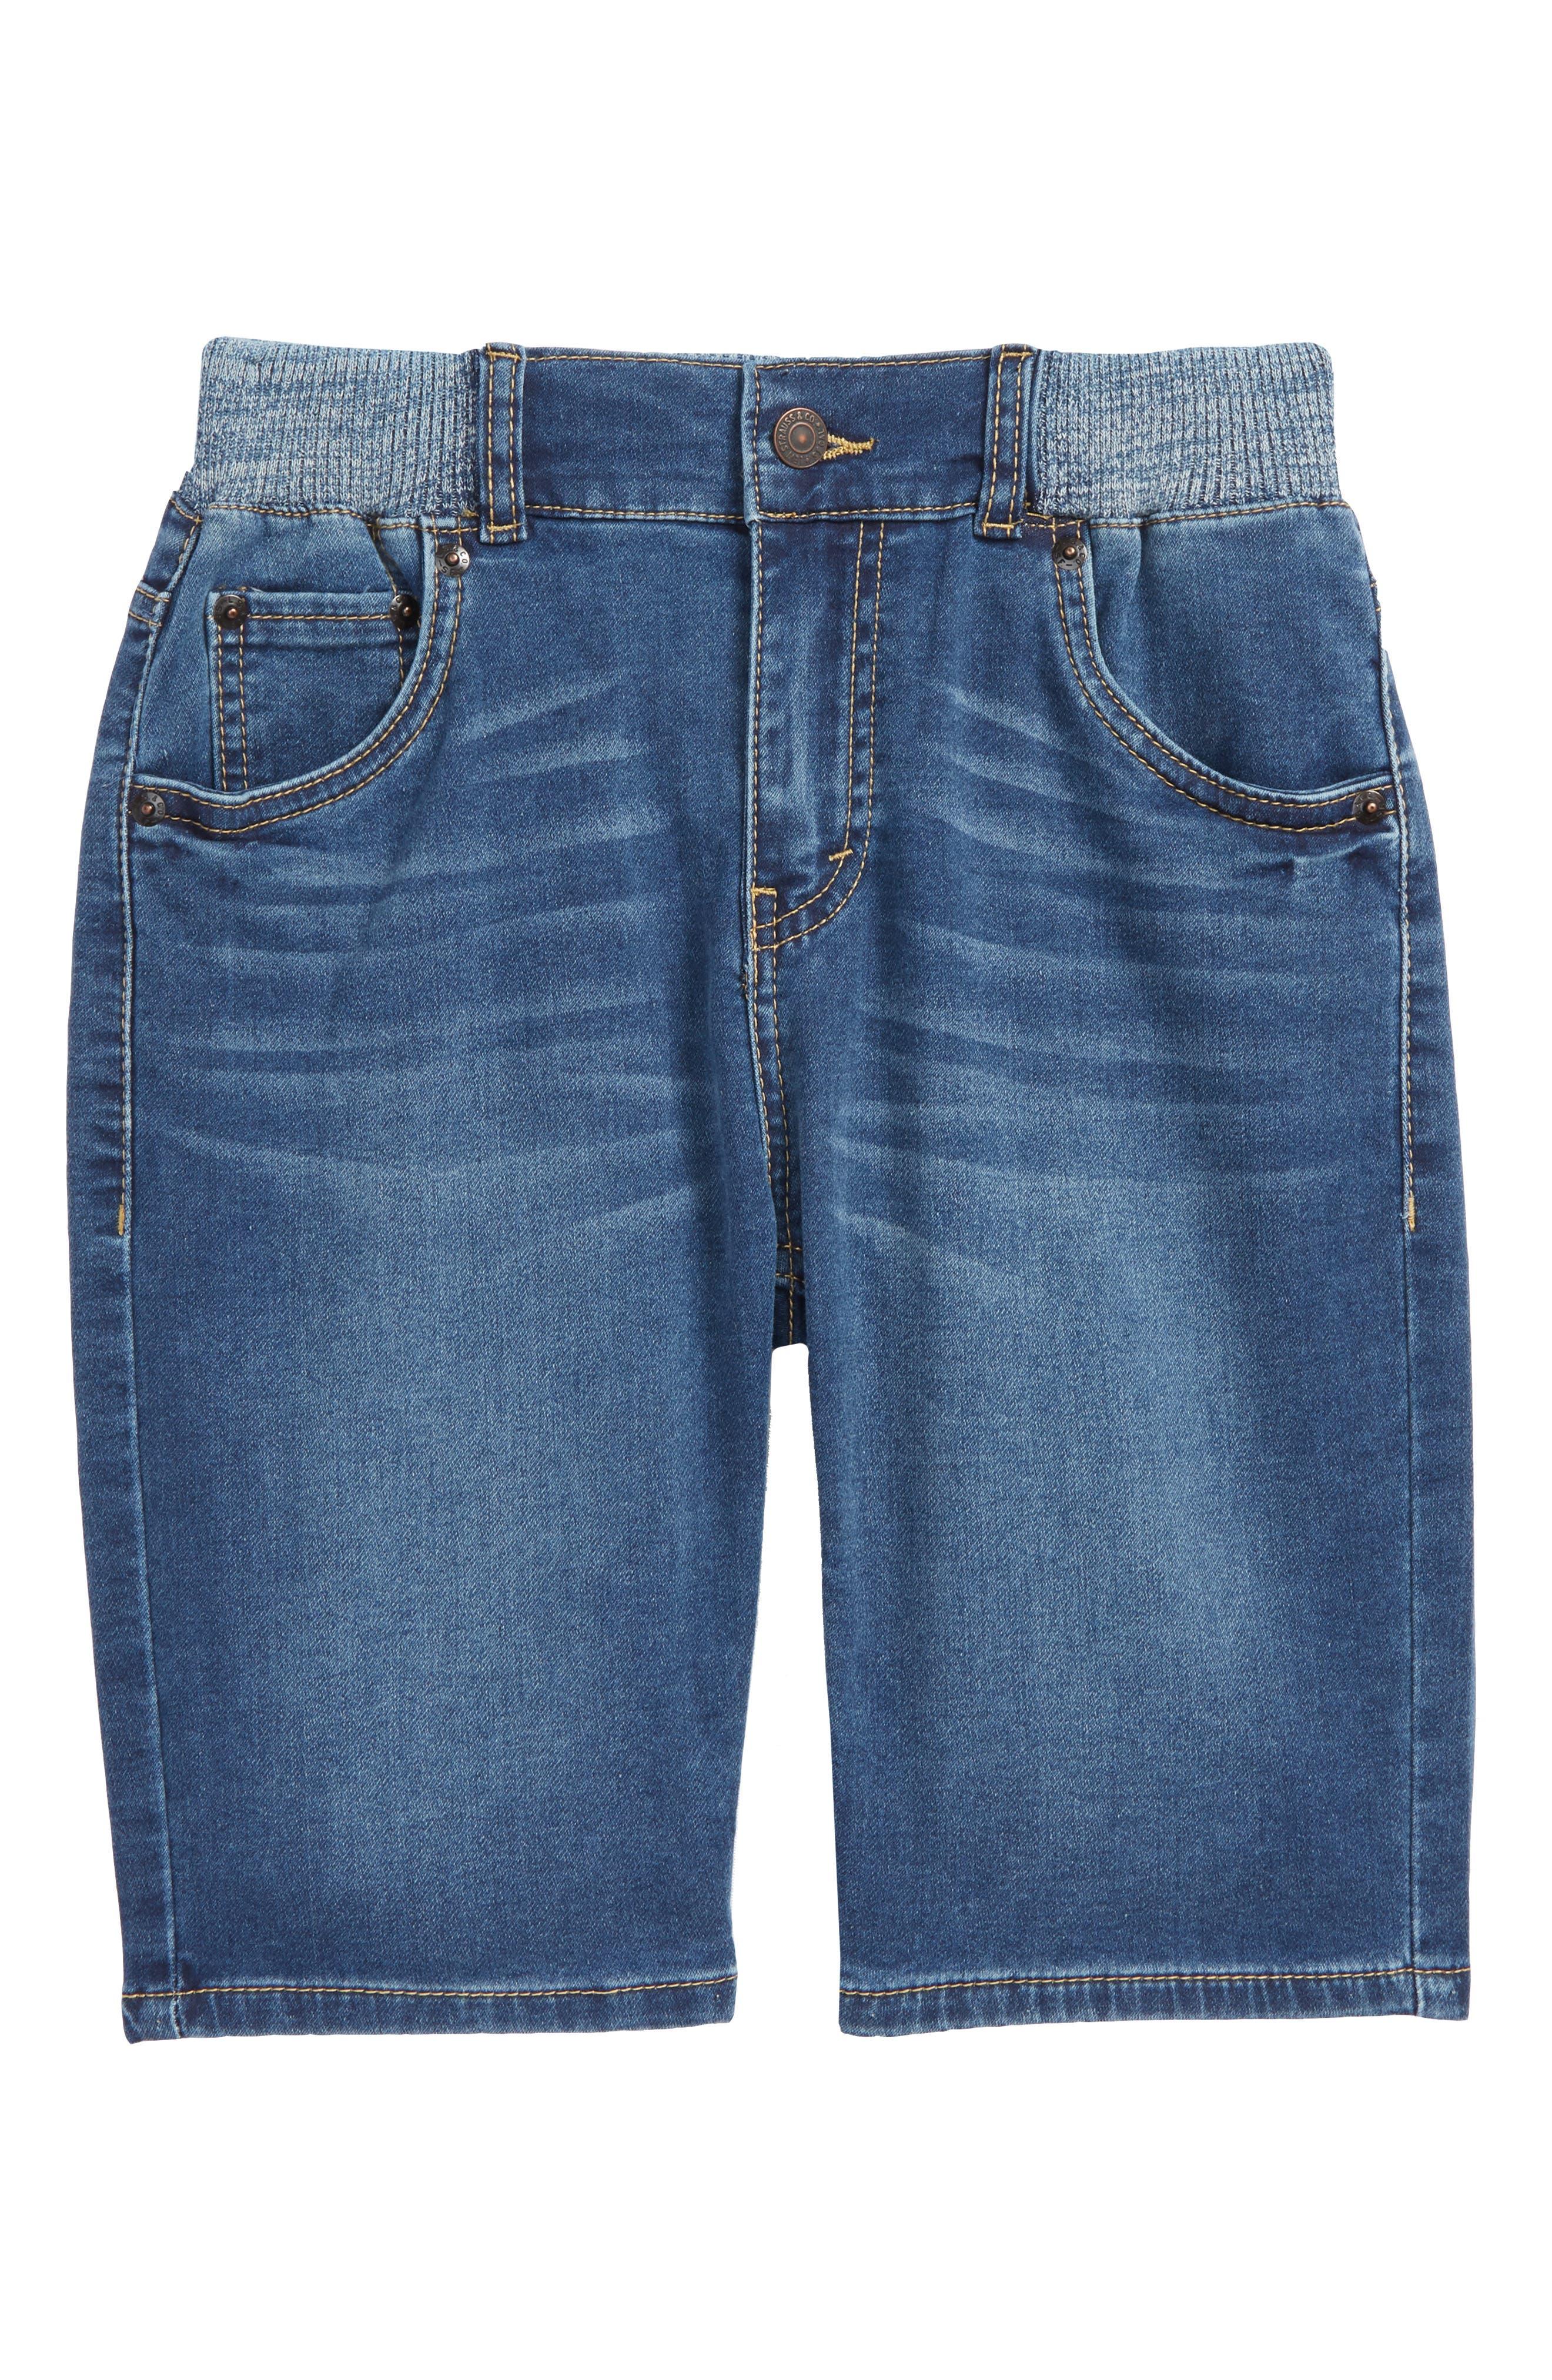 Levi's Super Chill Denim Shorts,                         Main,                         color, 421